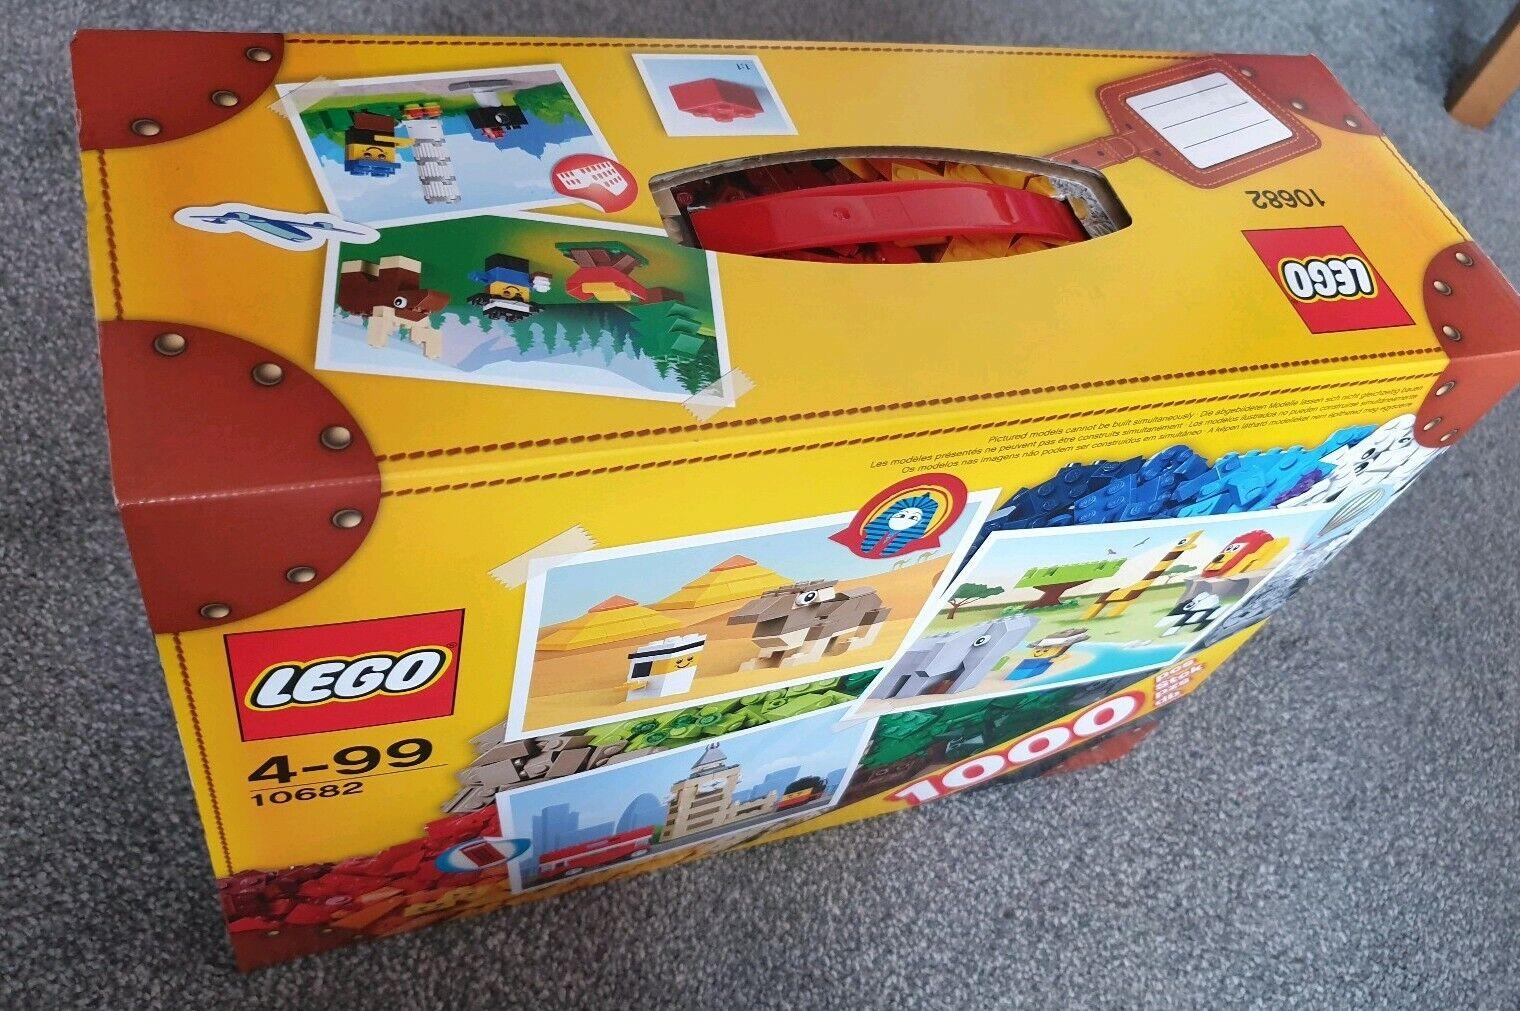 Lego 10682 bricks and mer kreativt resväska 1000 bitar Sällsynta Set BNIB